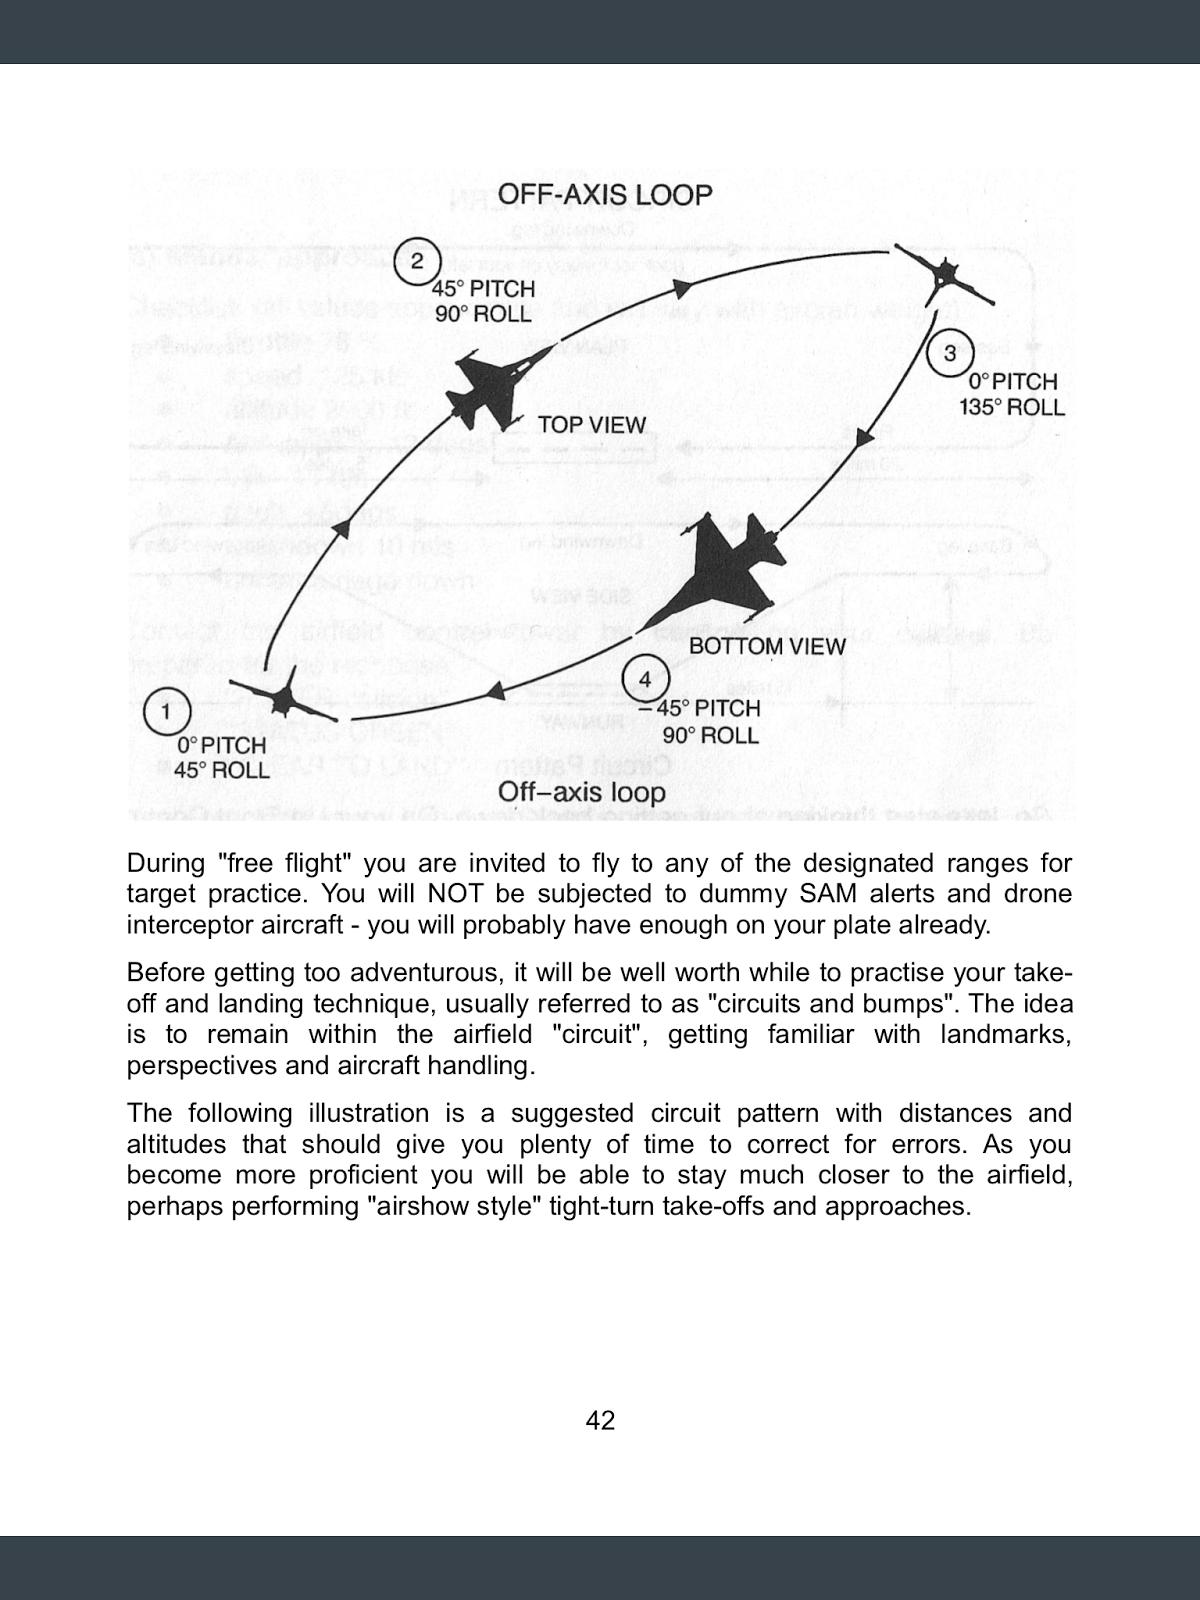 F 16 Combat pilot Manual Pdf